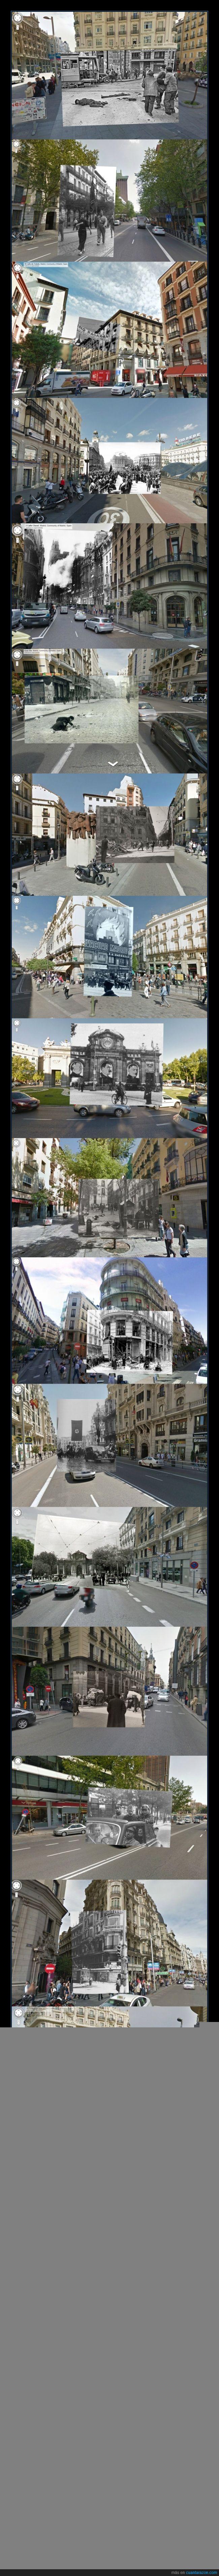 ahora,antes,Google Street View,Guerra Civil,madrid,montaje